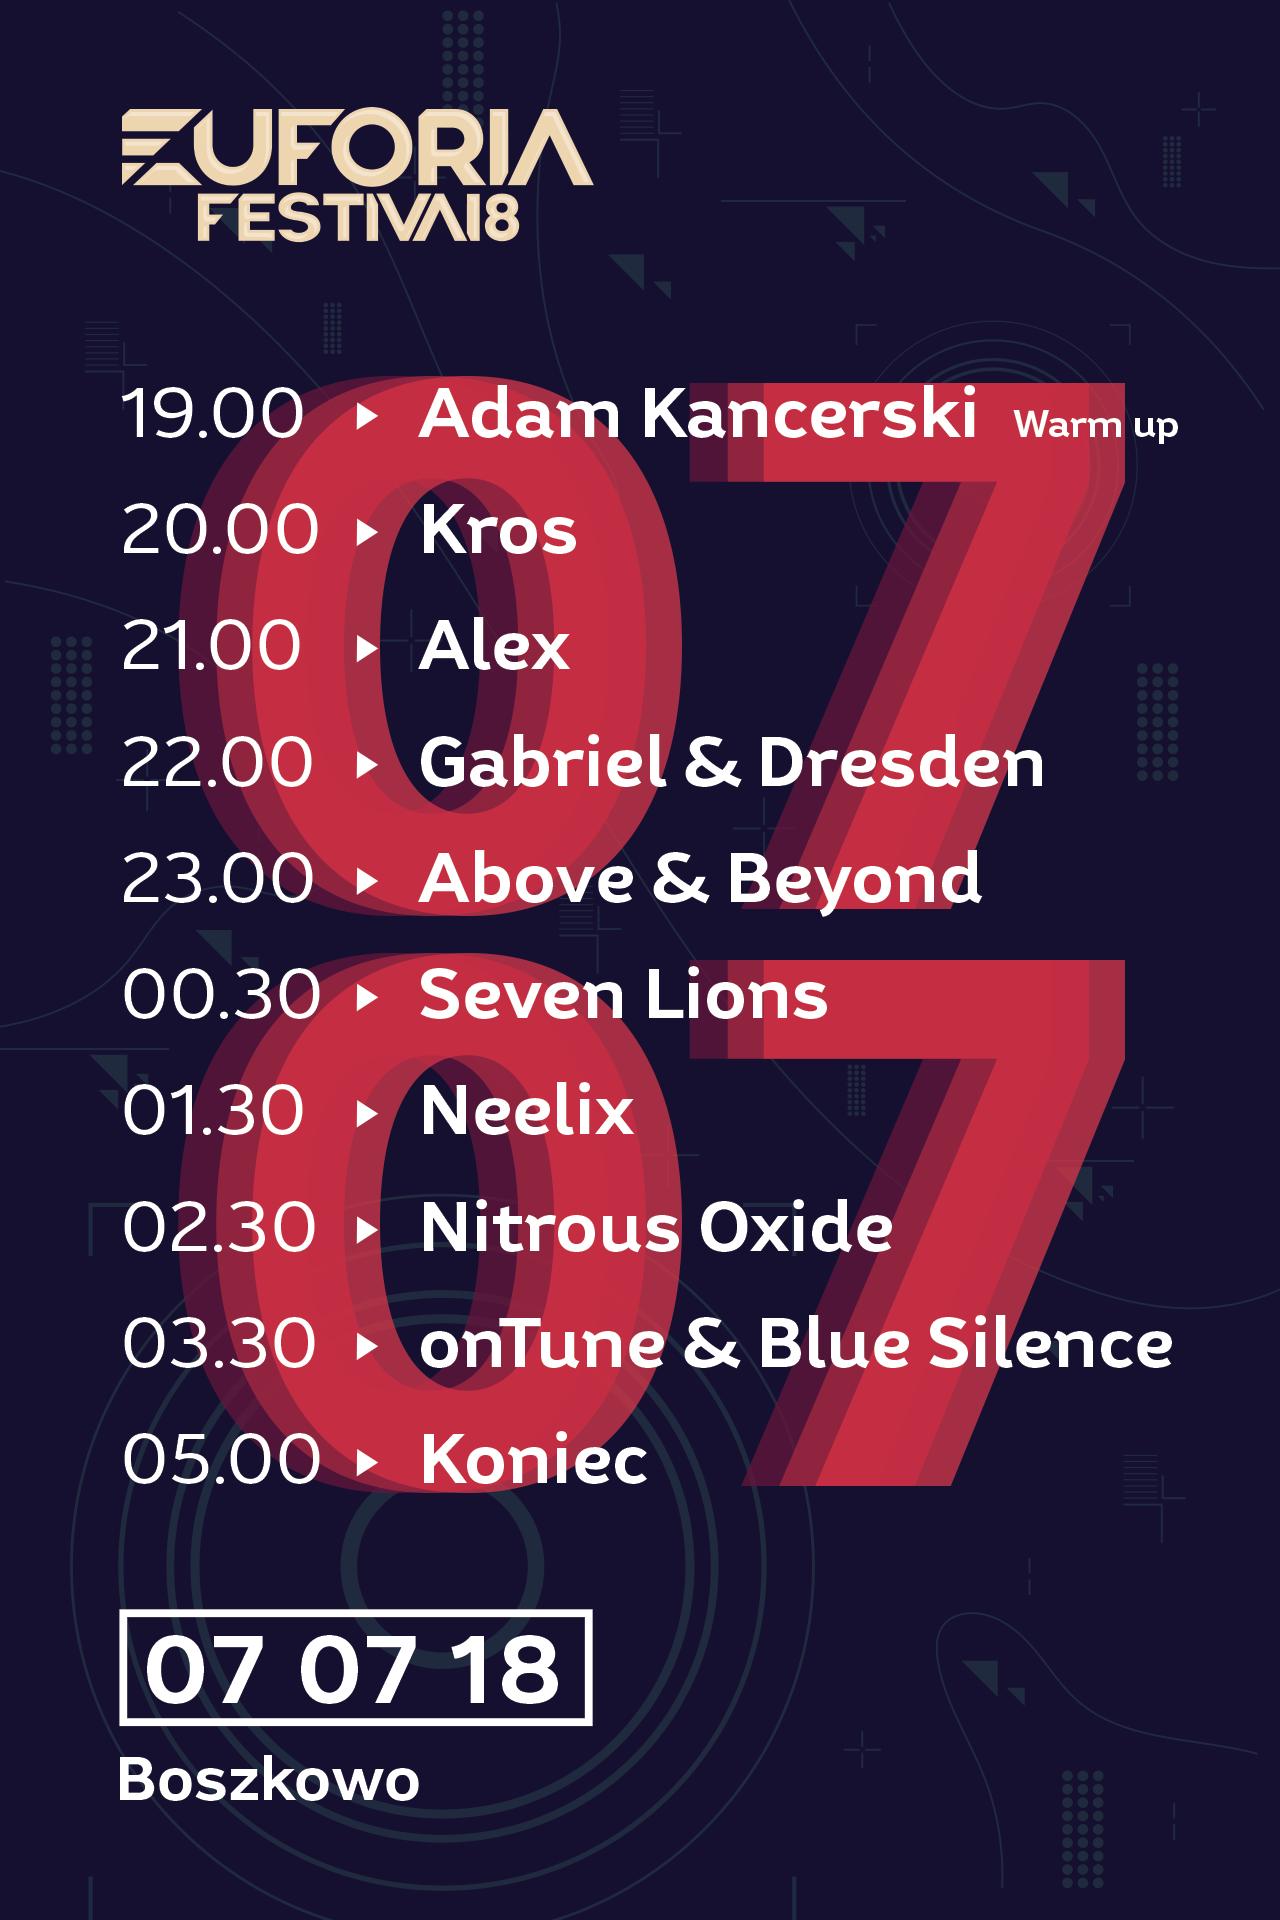 euforia boszkowo plaża hotel sulikowski nocleg wynajem back forth tranceformations line up 2019 above beyond neelix